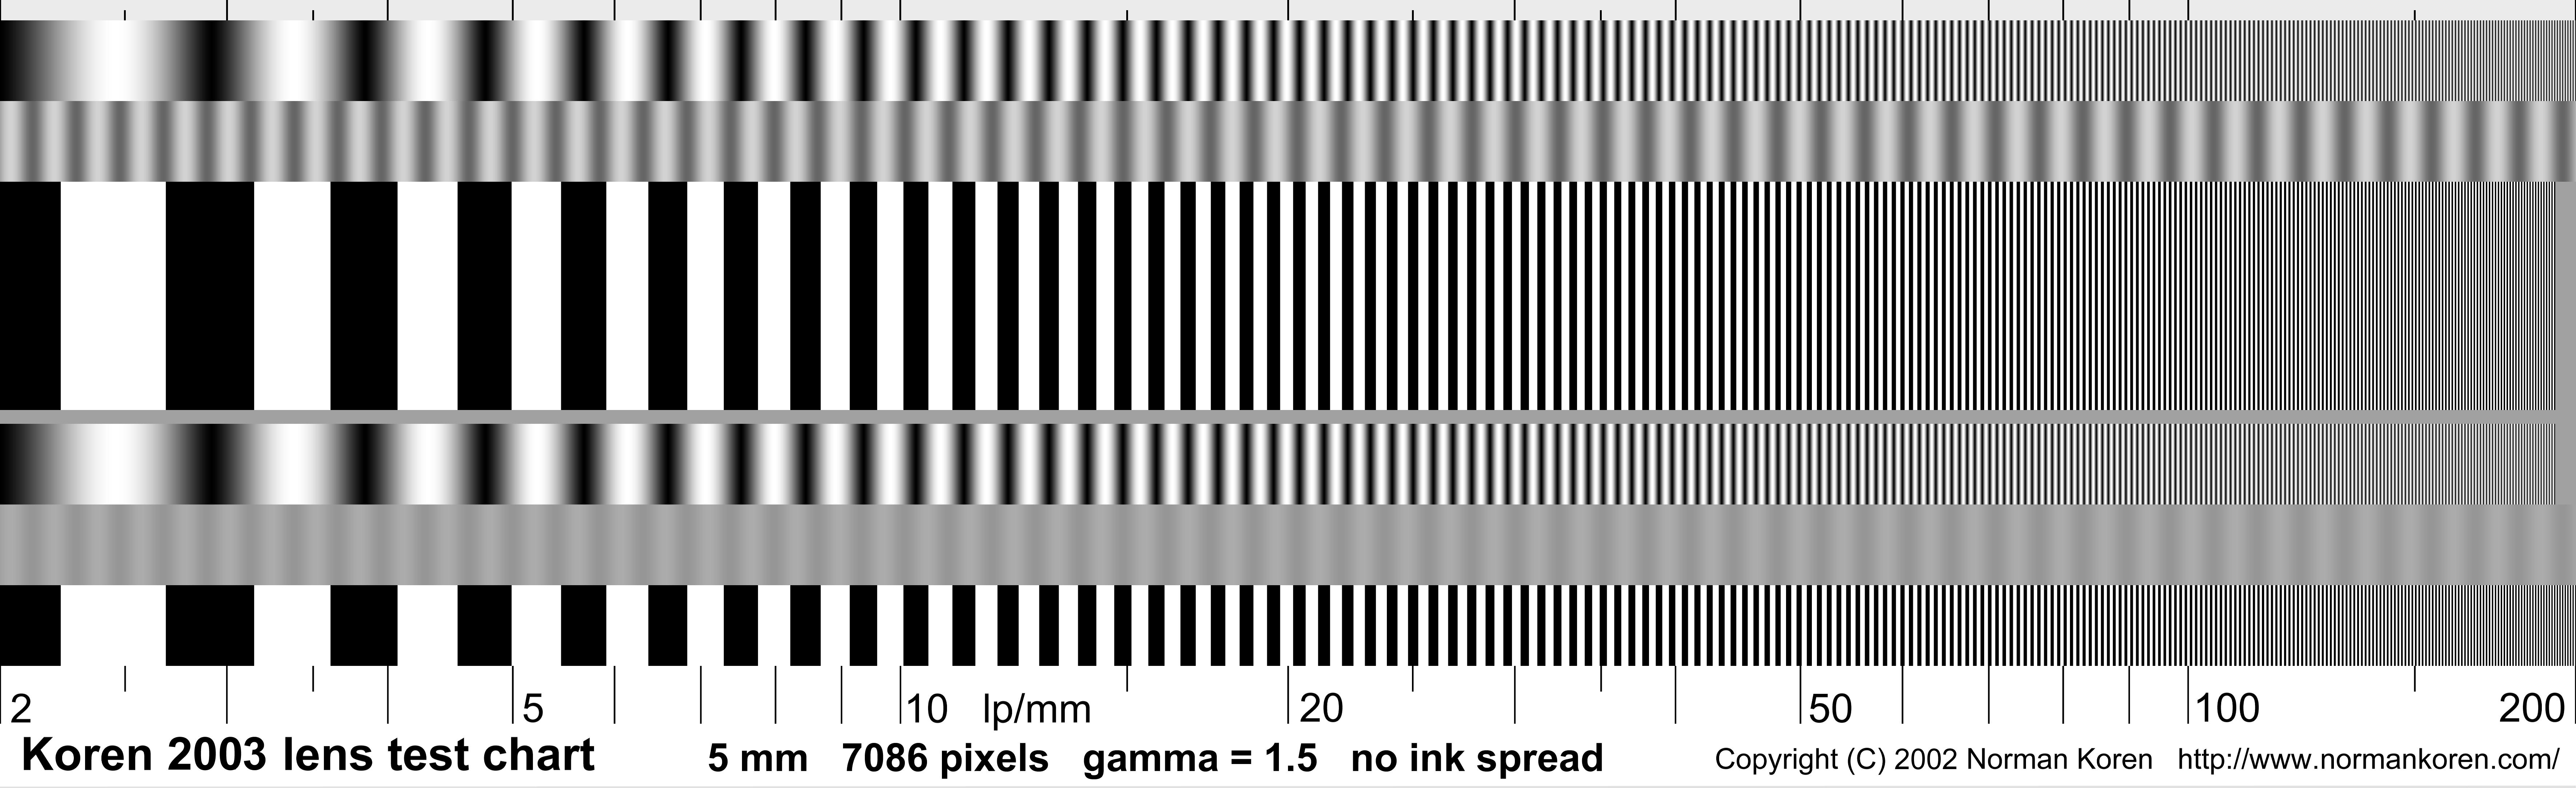 Lens Testing